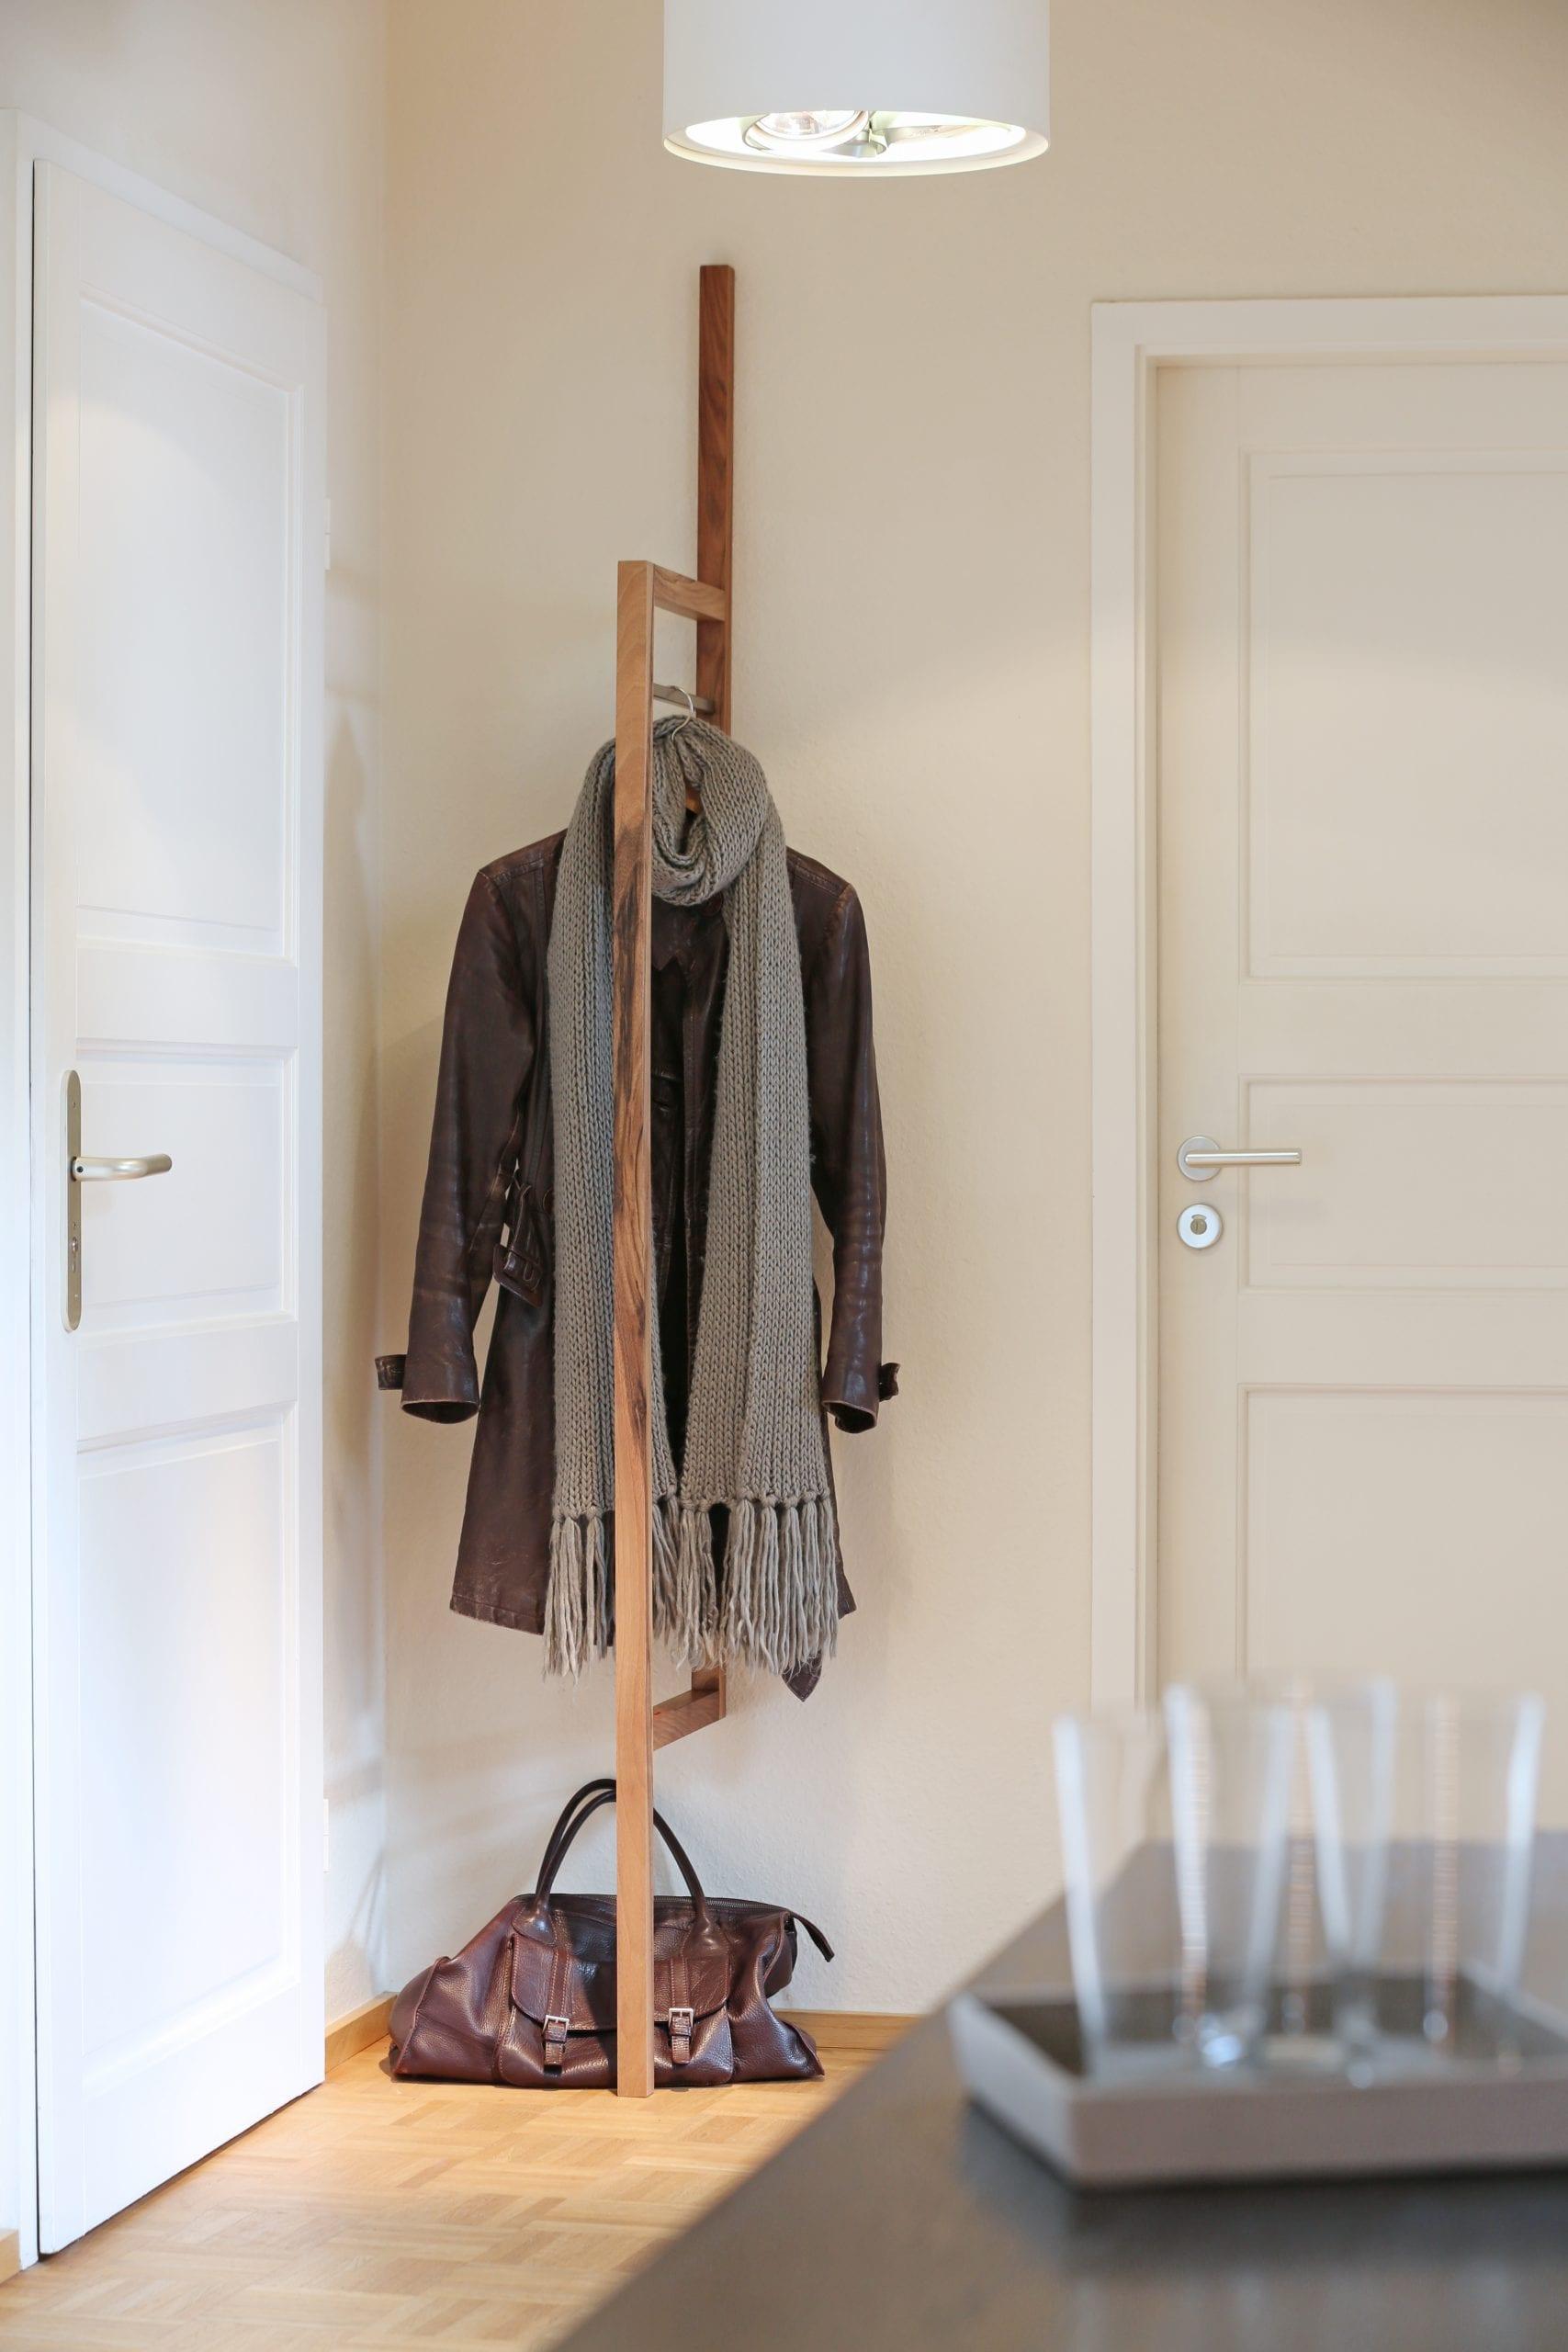 Made-in-Taunus-accessoires-Garderobe-Helena-18